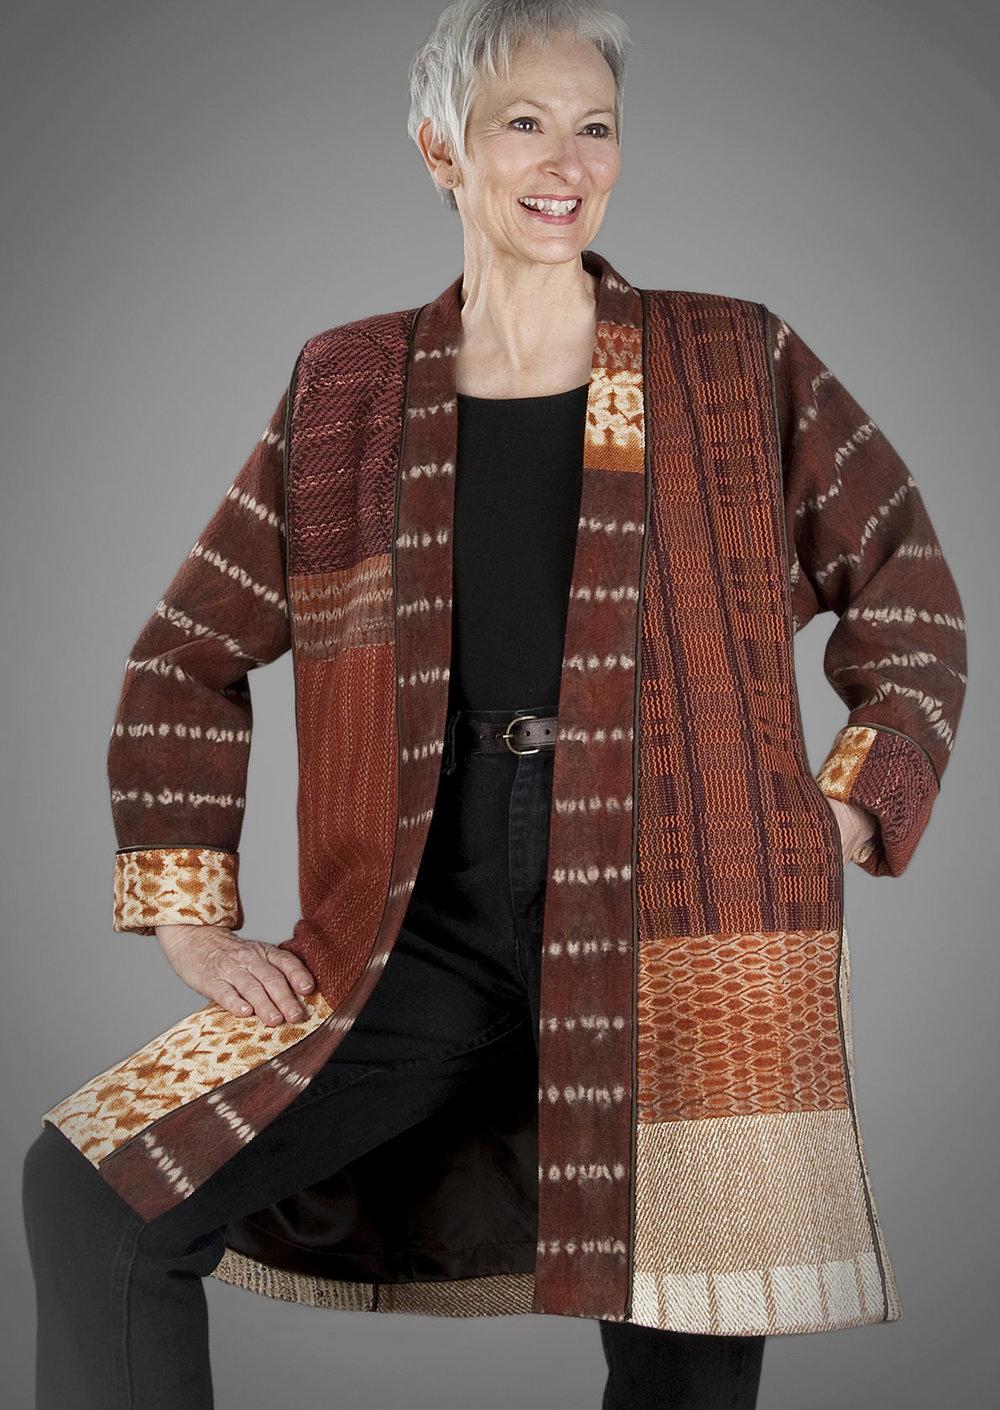 Liz Spear Hand Woven, Art-To-Wear, Clothing.jpg